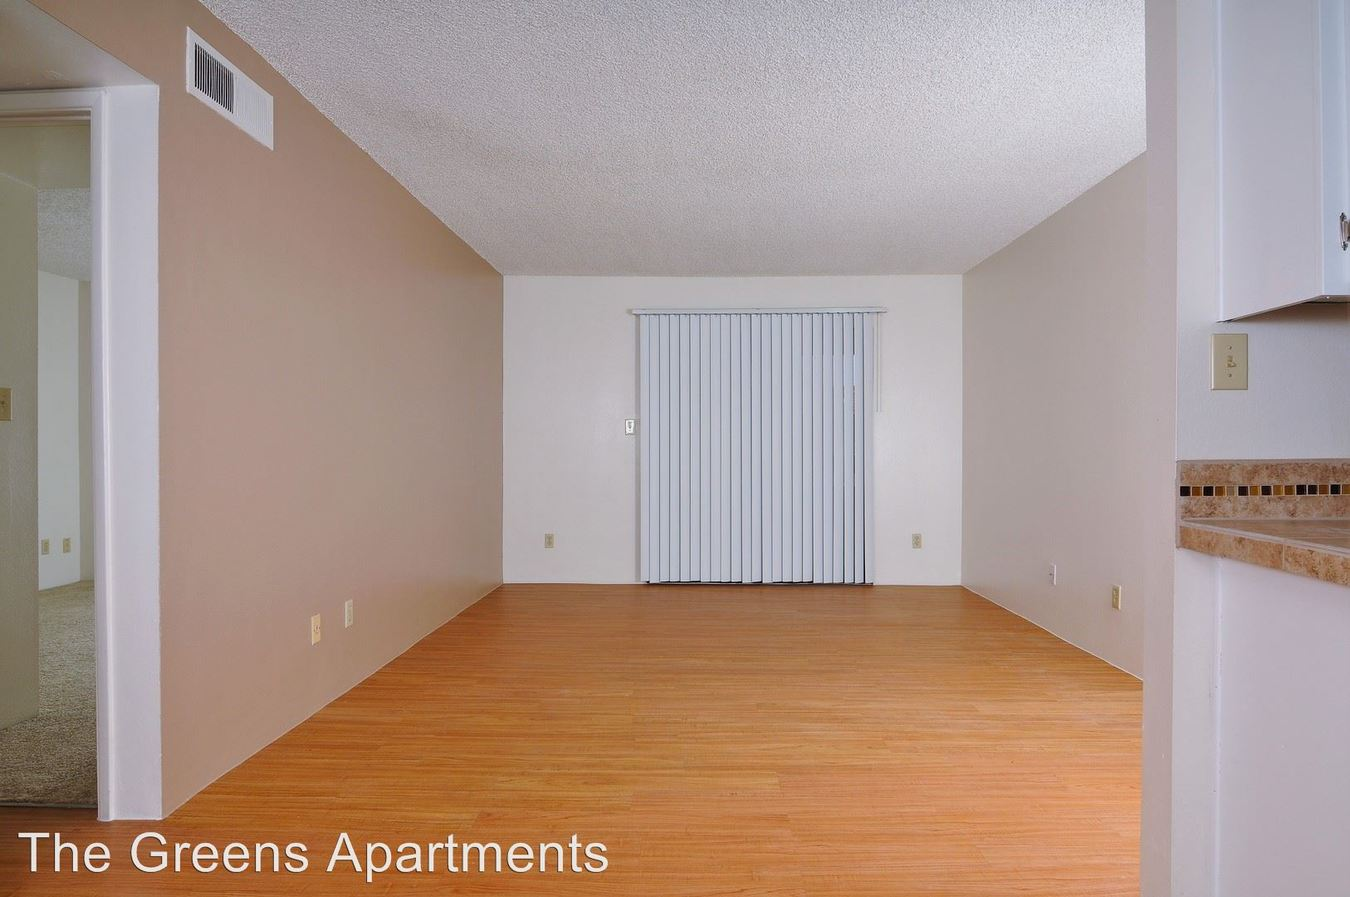 2 Bedrooms 1 Bathroom Apartment for rent at 8445 North 23rd Avenue in Phoenix, AZ